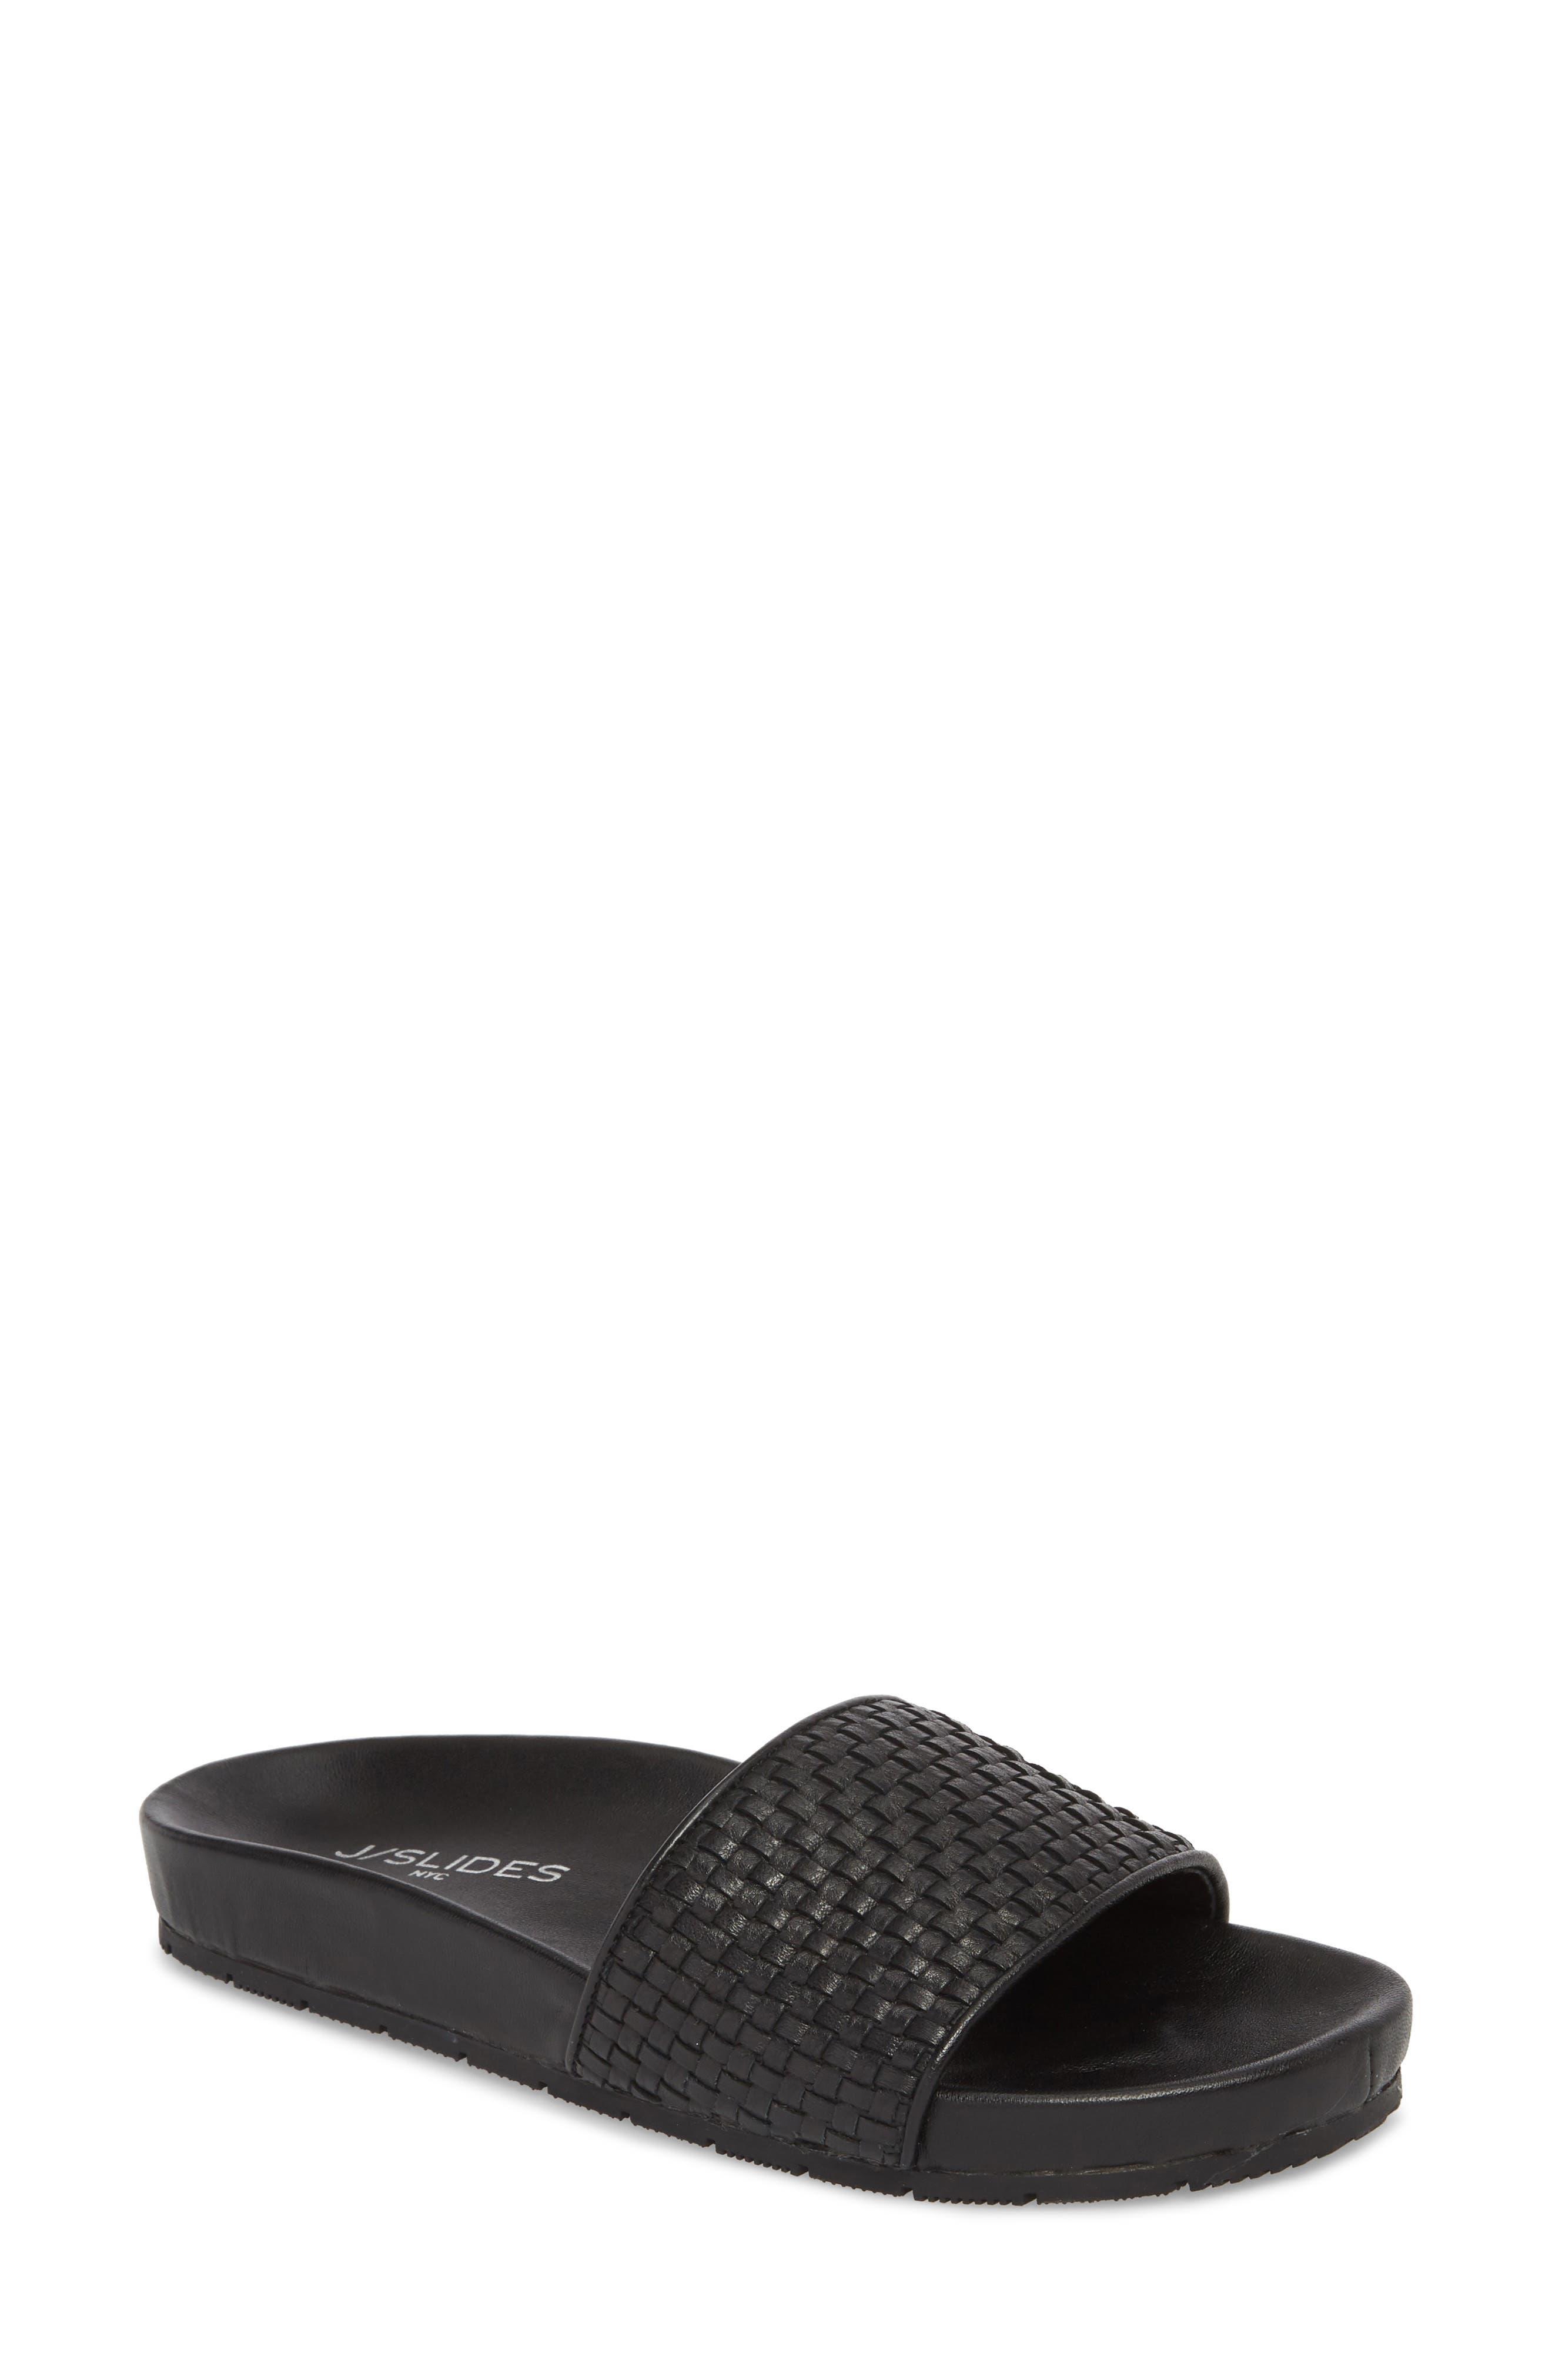 Naomie Slide Sandal,                         Main,                         color, 015